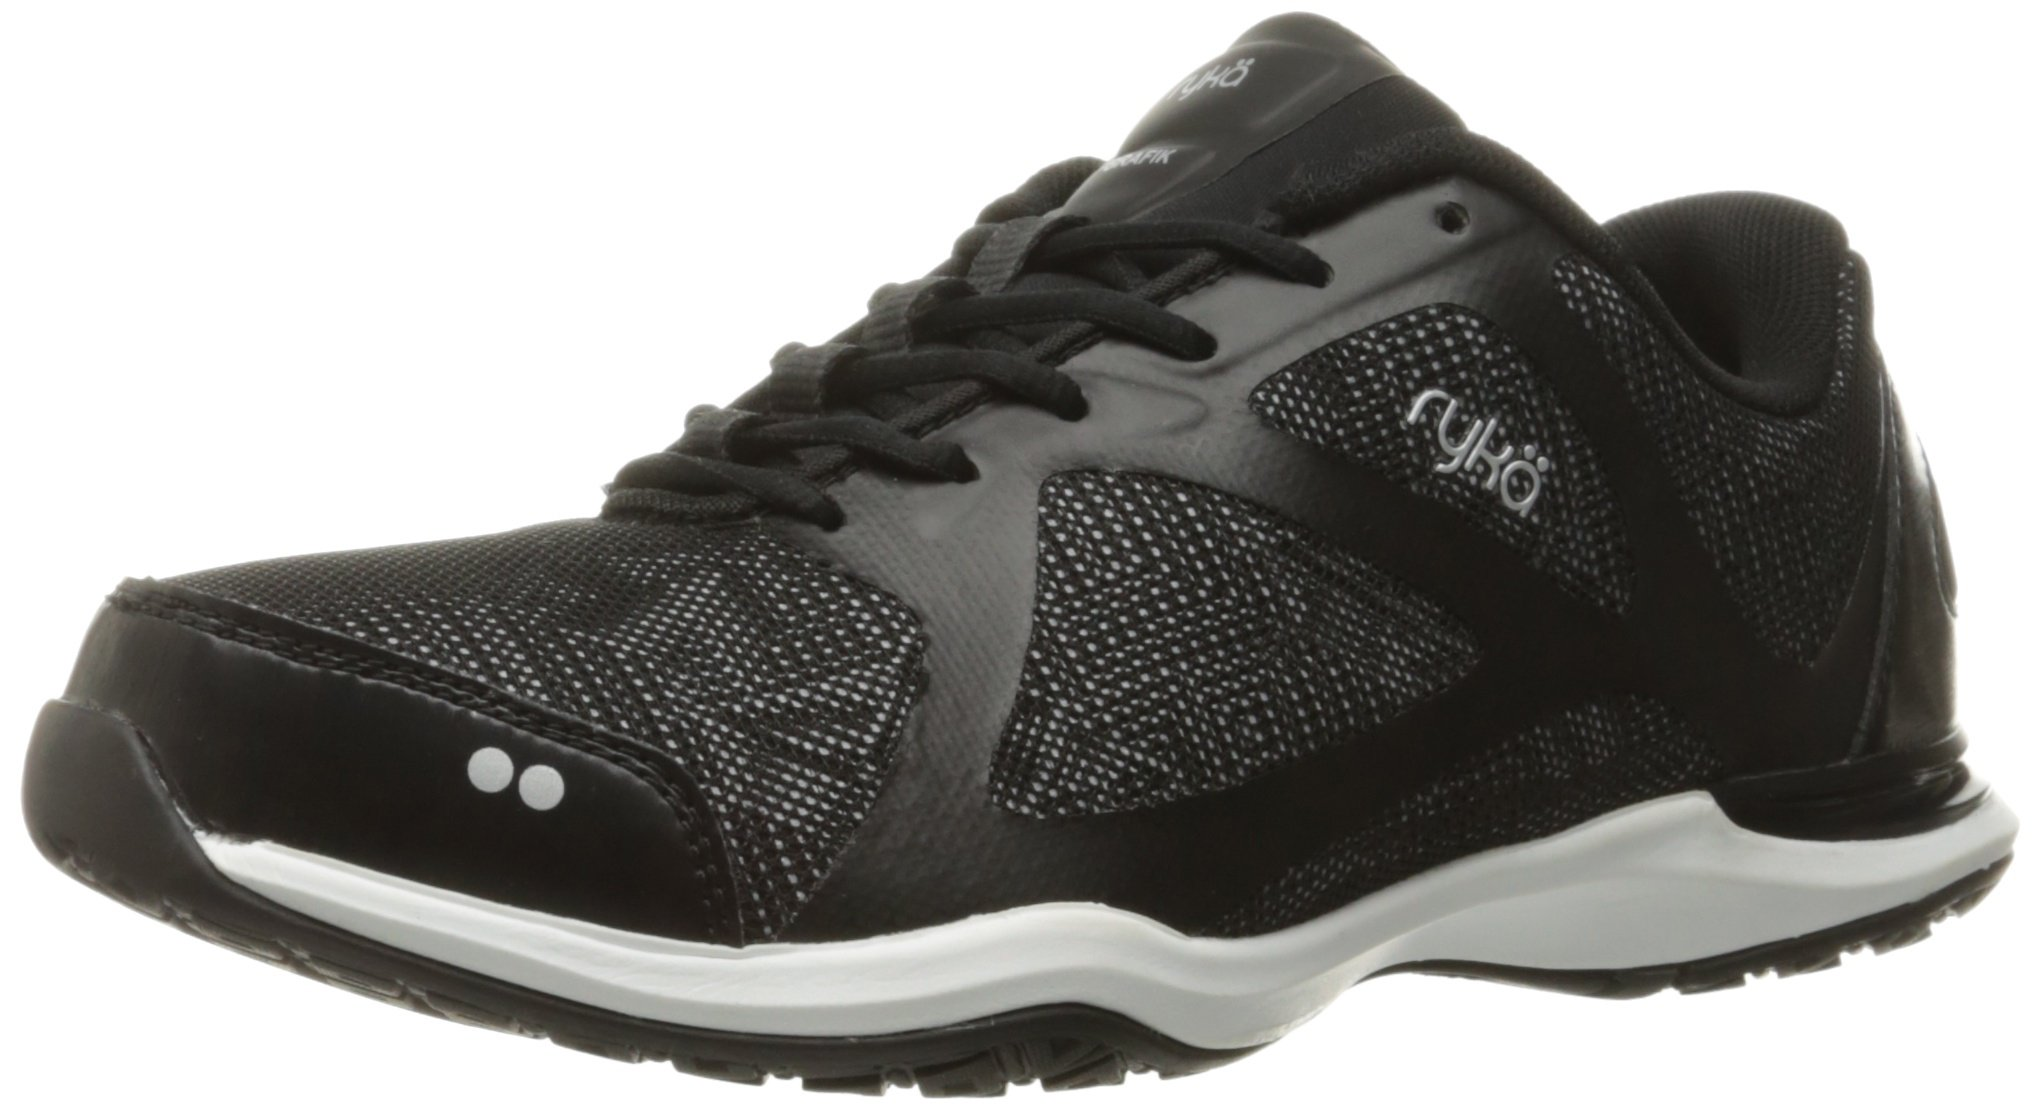 Ryka Women's Grafik Cross-Trainer Shoe, Black/Grey, 9 M US